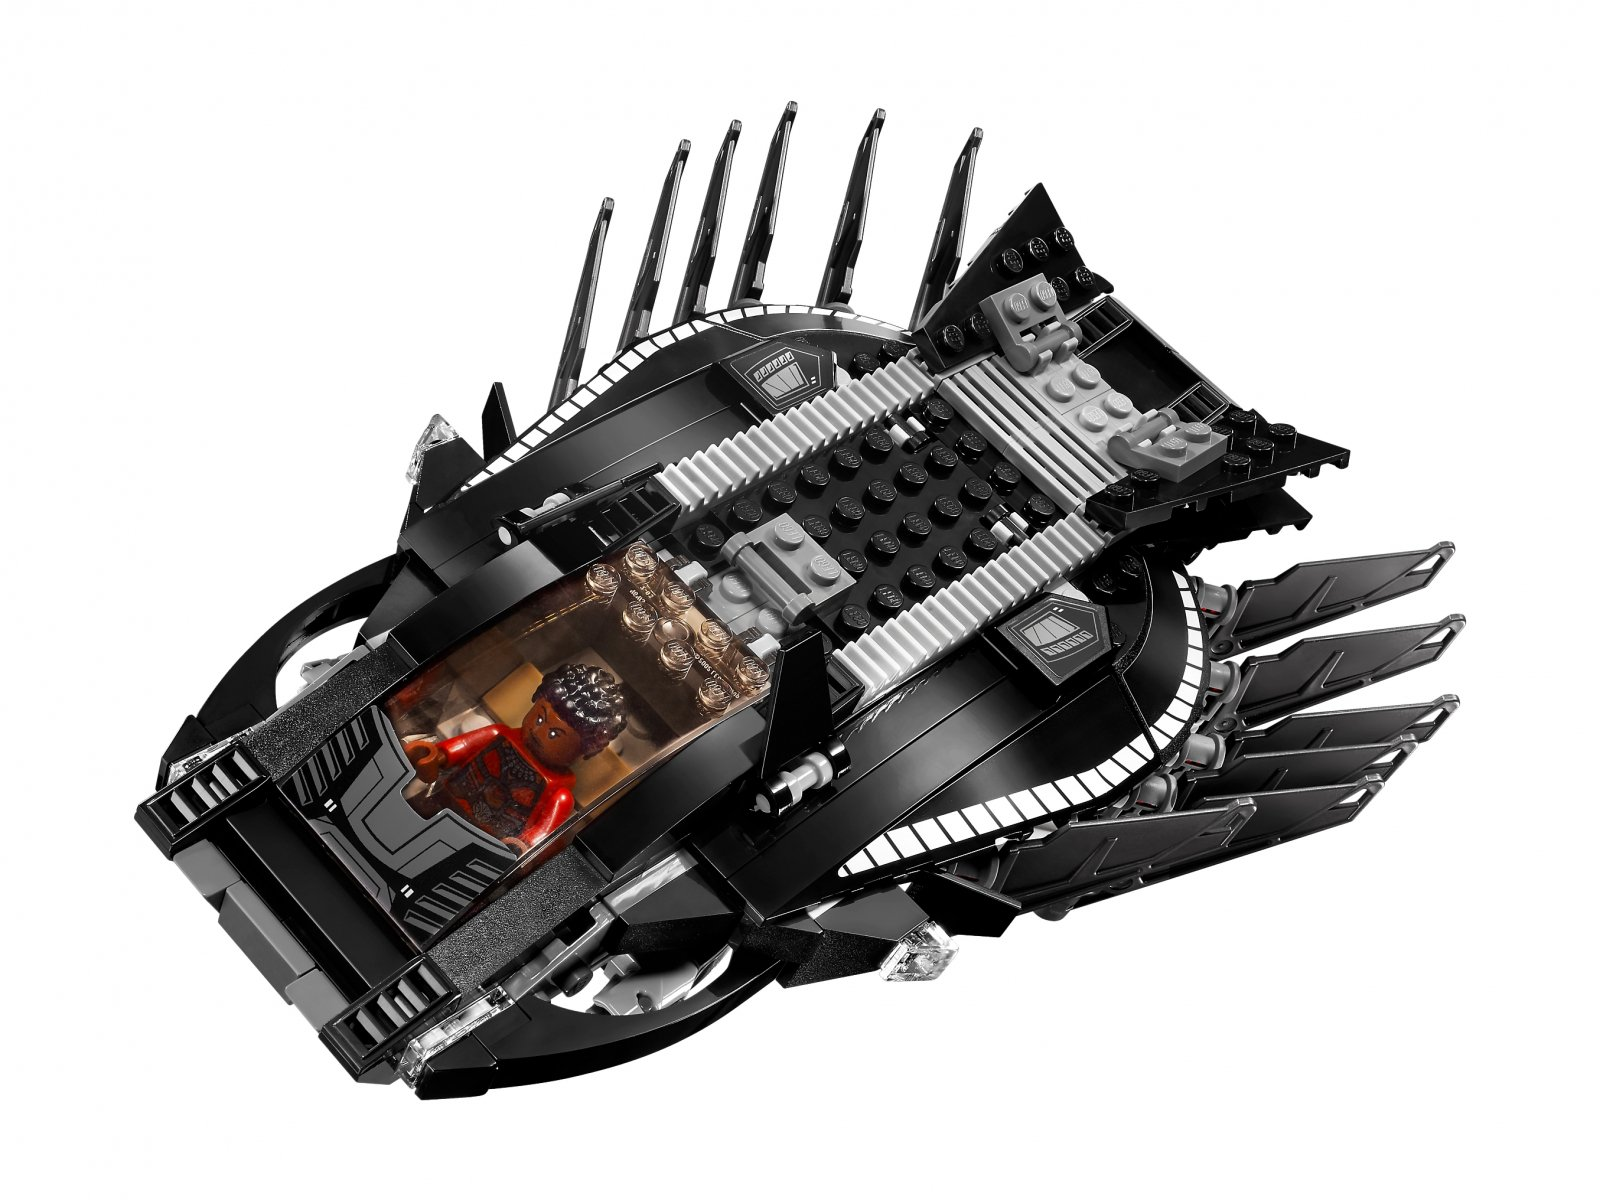 LEGO 76100 Atak myśliwca Royal Talon Fighter